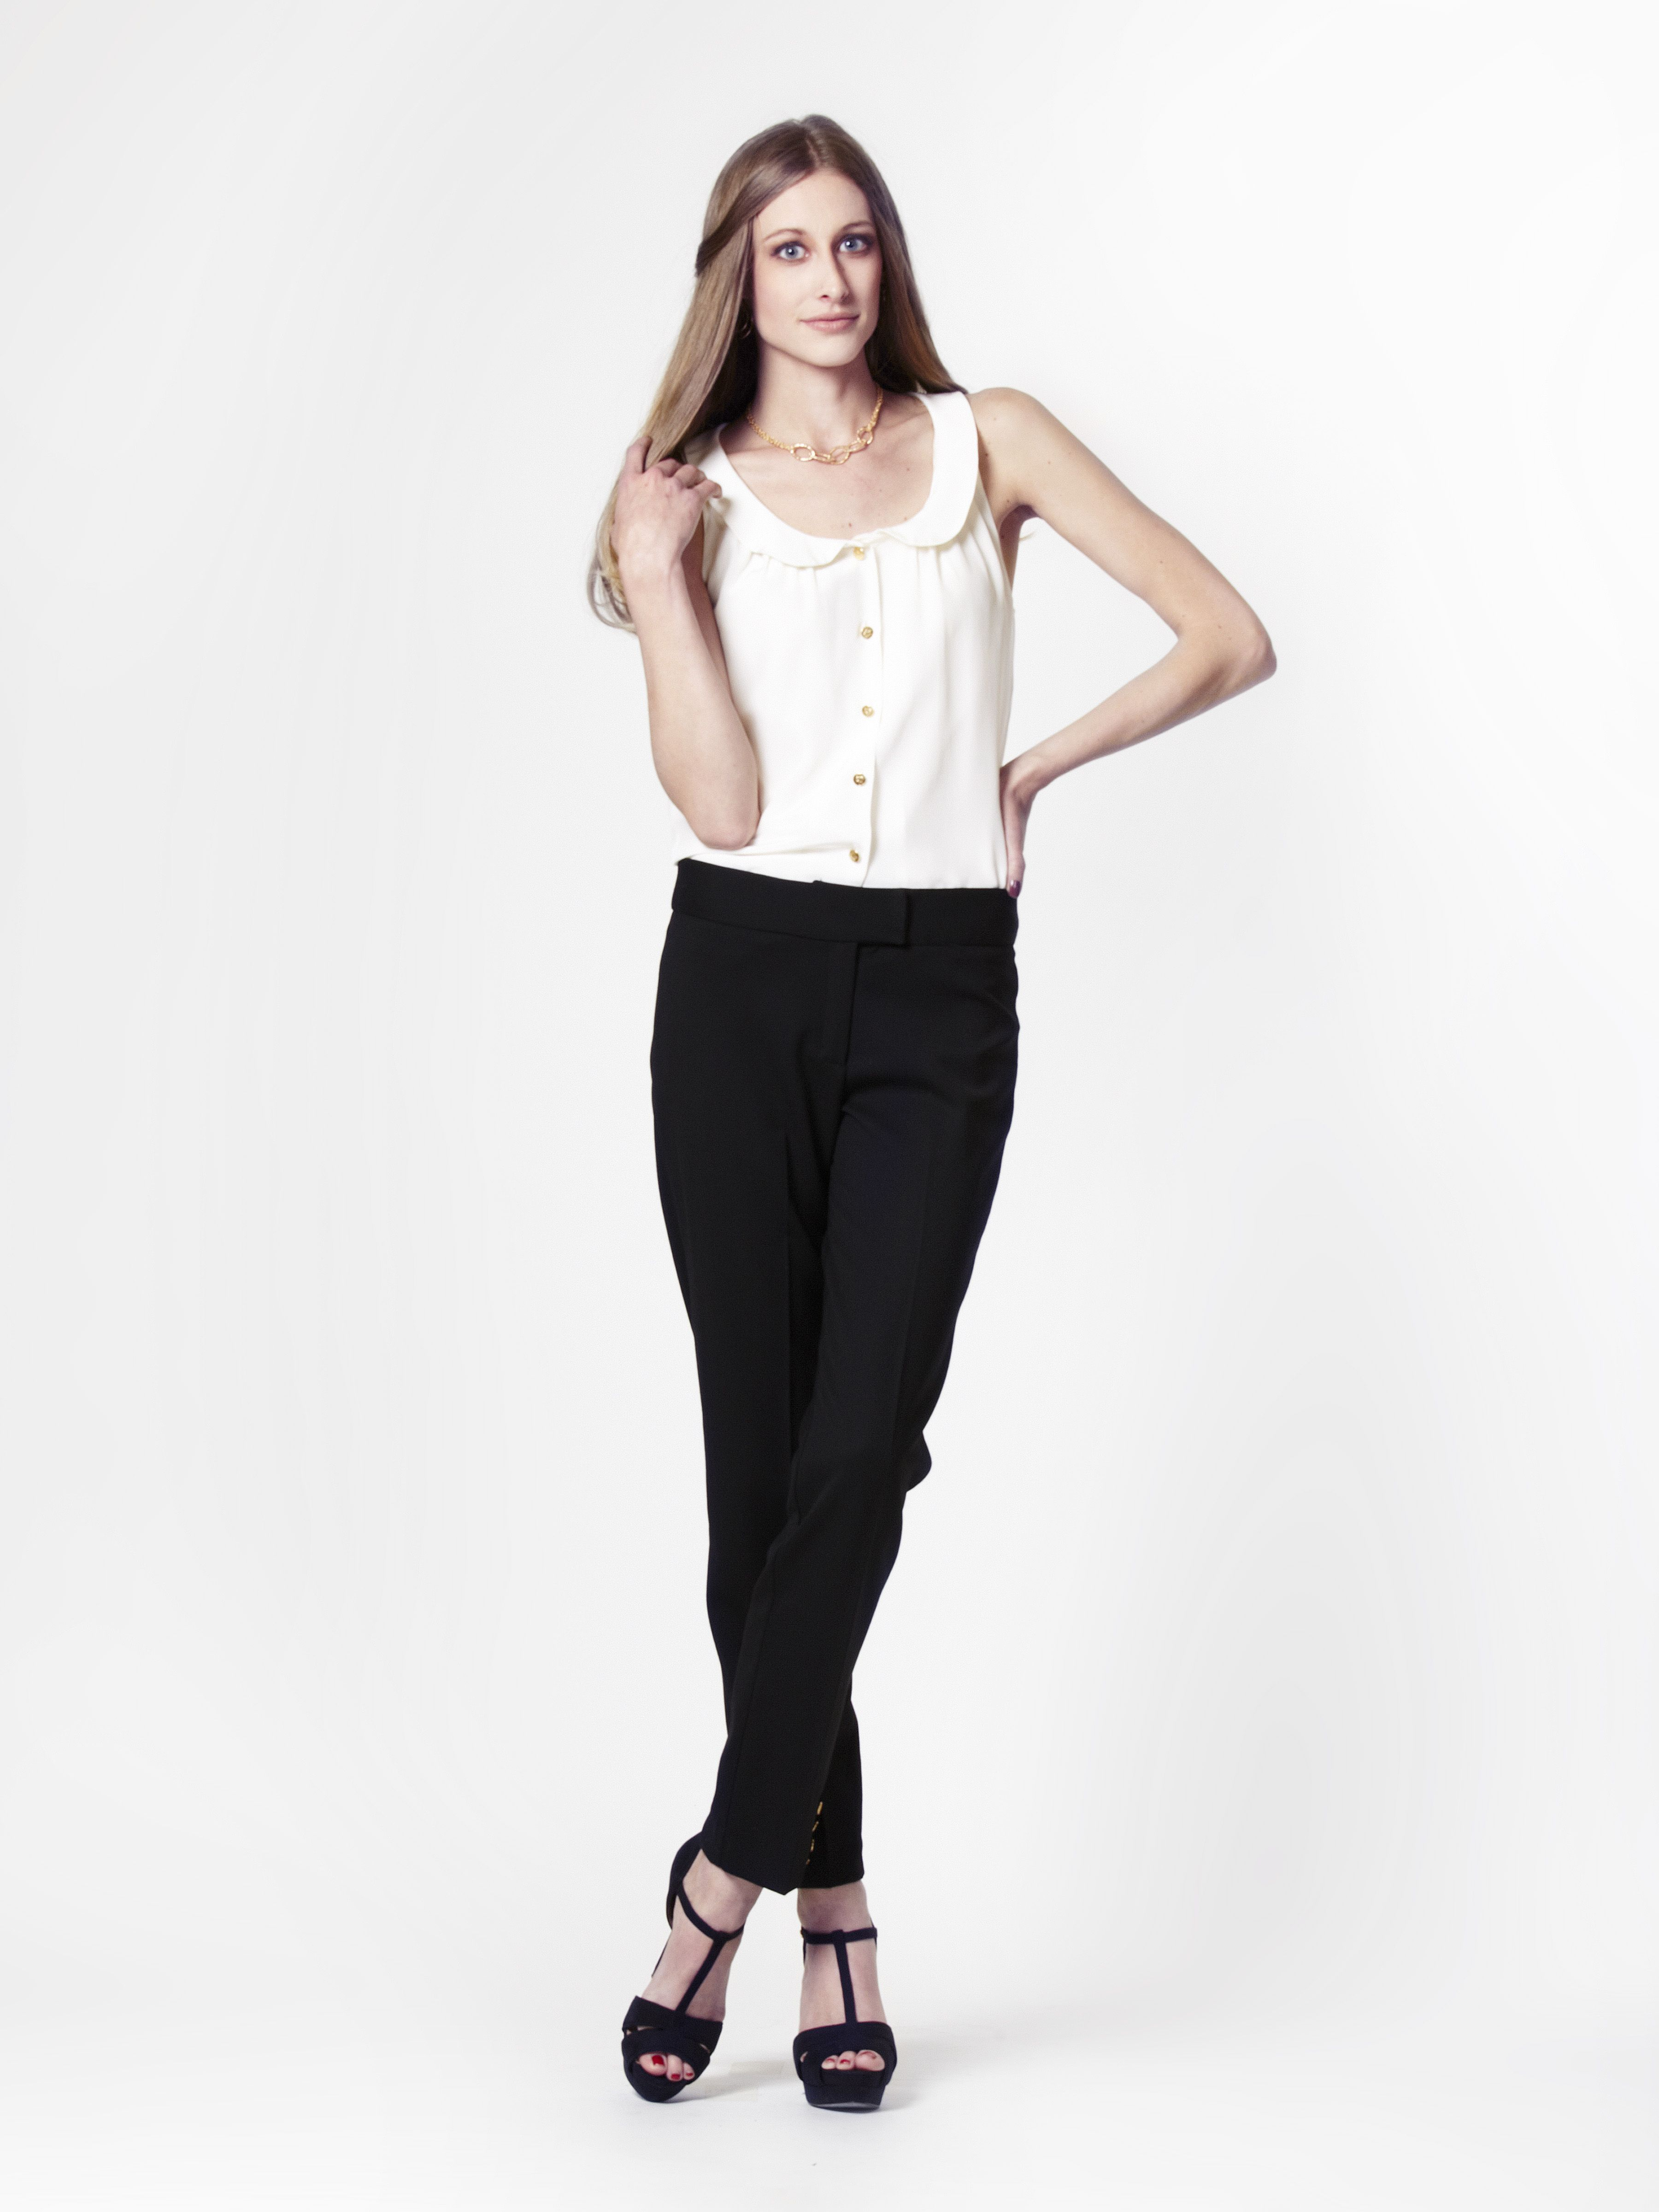 Beth Top in Cream Silk + Cigarette Pant in Black Wool by LEONA